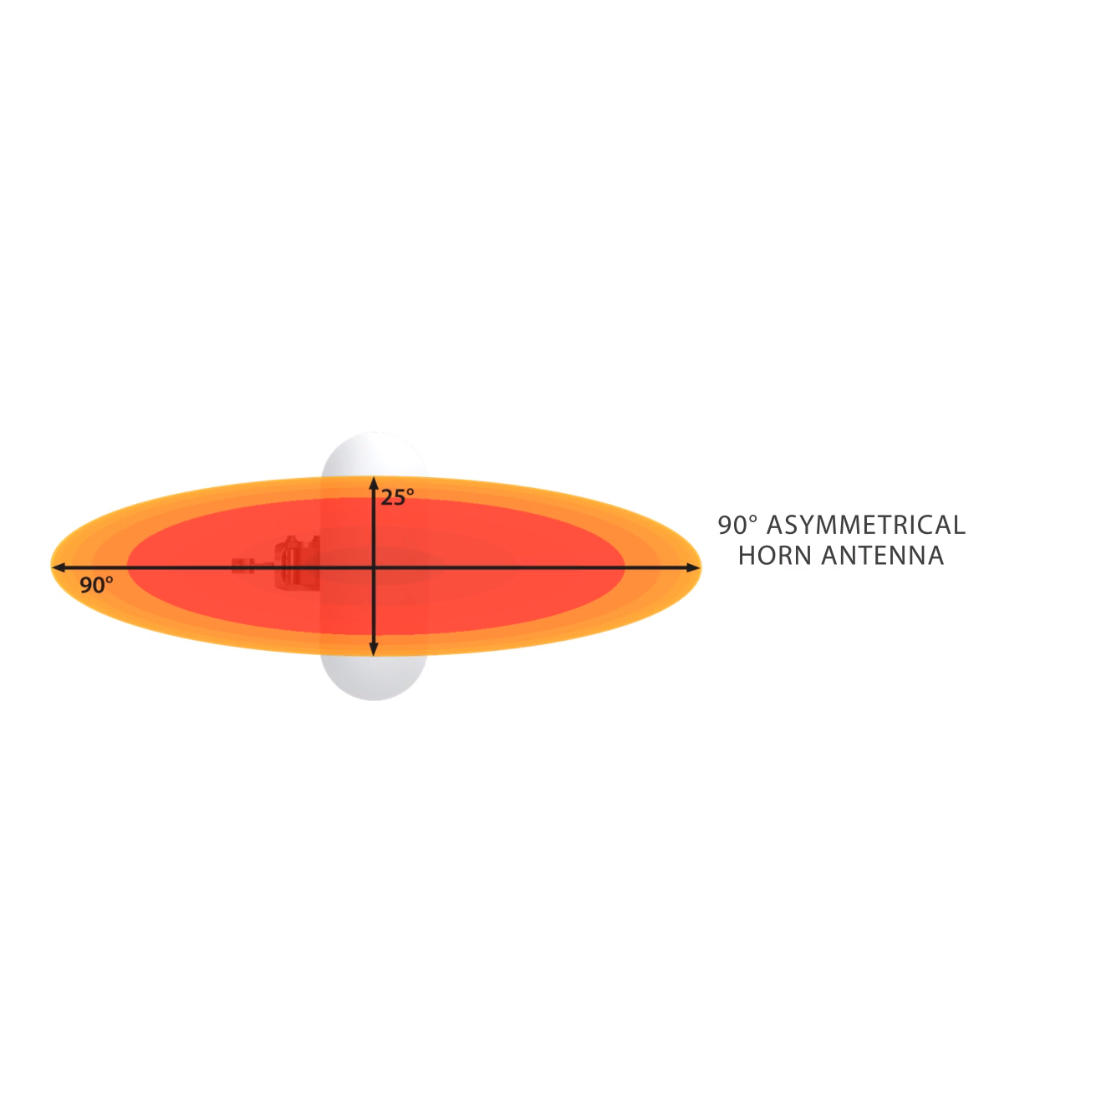 Ассимметричная лучевая антенна RF elements HG3-TP-A90 5GHz 16dBi